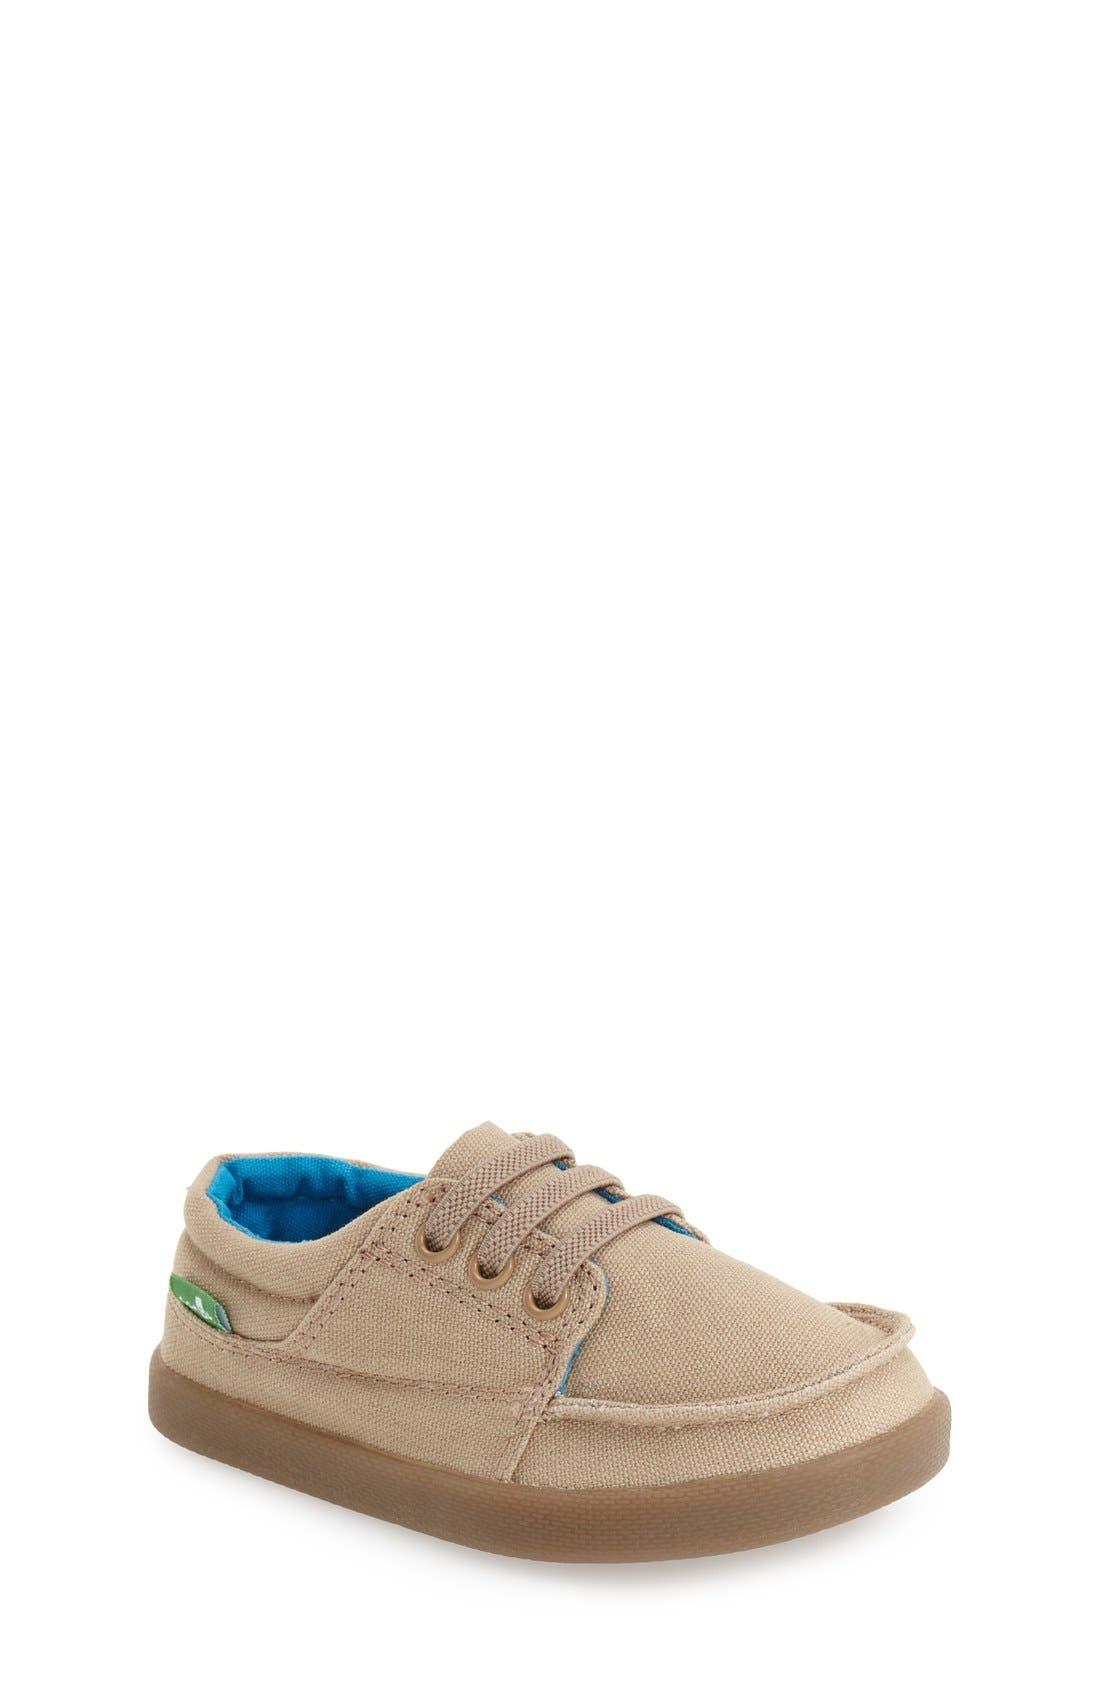 Sanuk 'Lil Tko' Sneaker (Toddler, Little Kid & Big Kid)